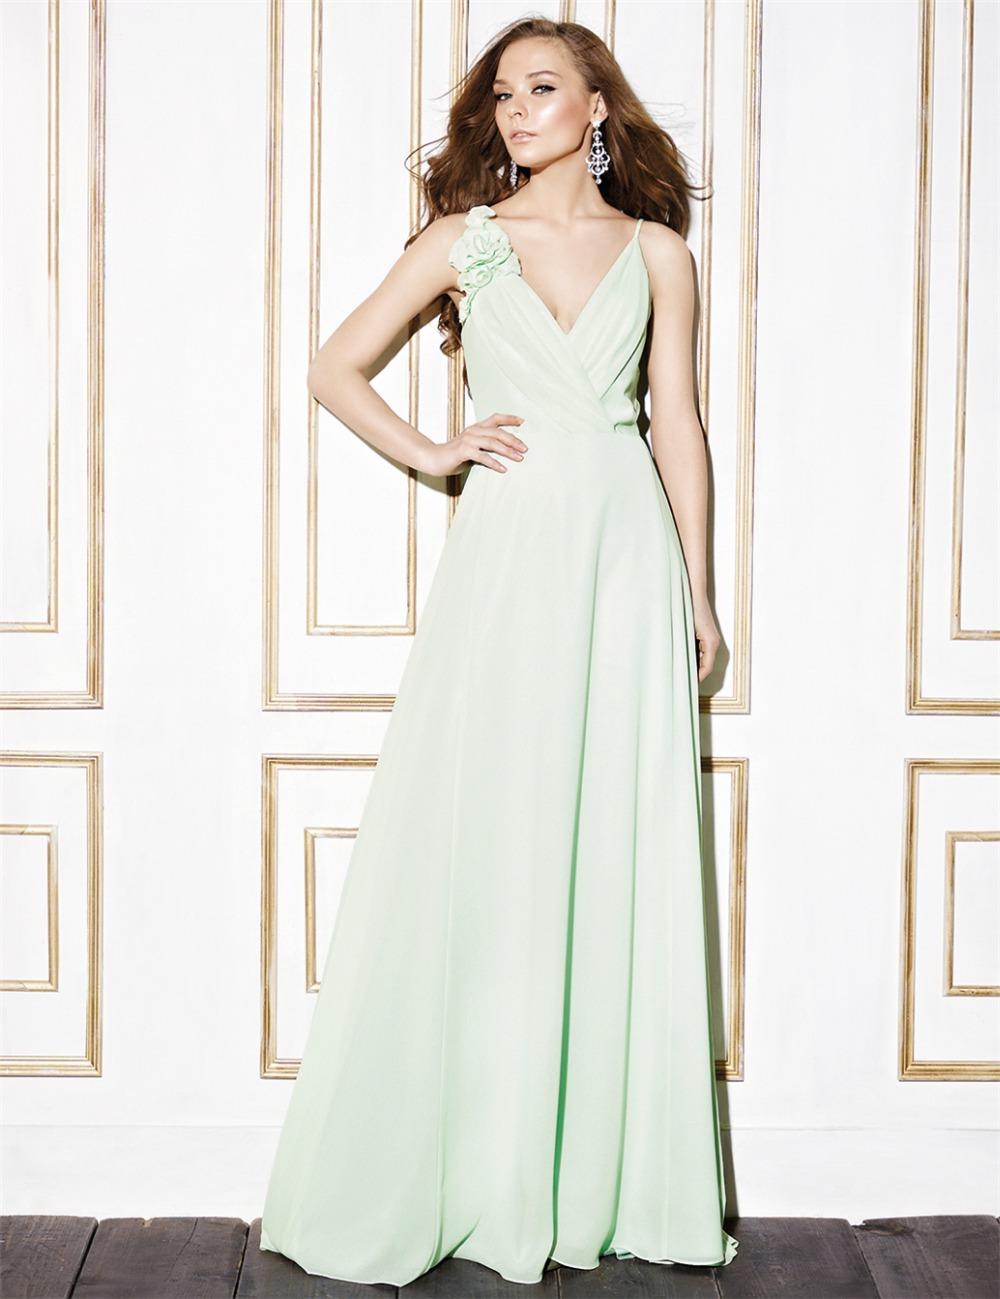 graduation gowns for sale | Gowns Ideas